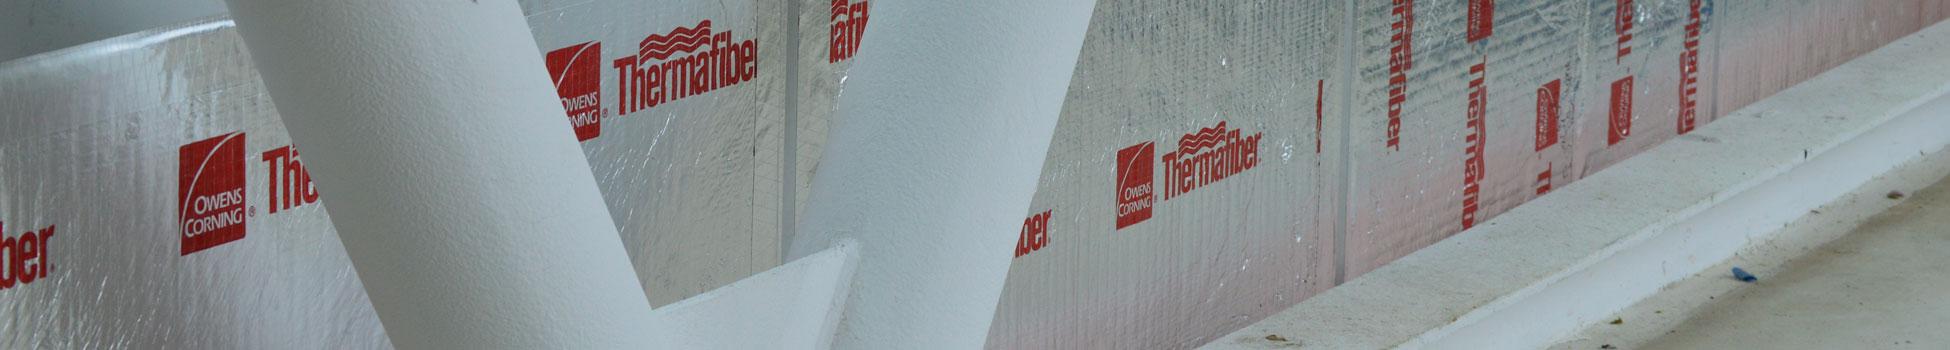 curtain wall firestop firestop